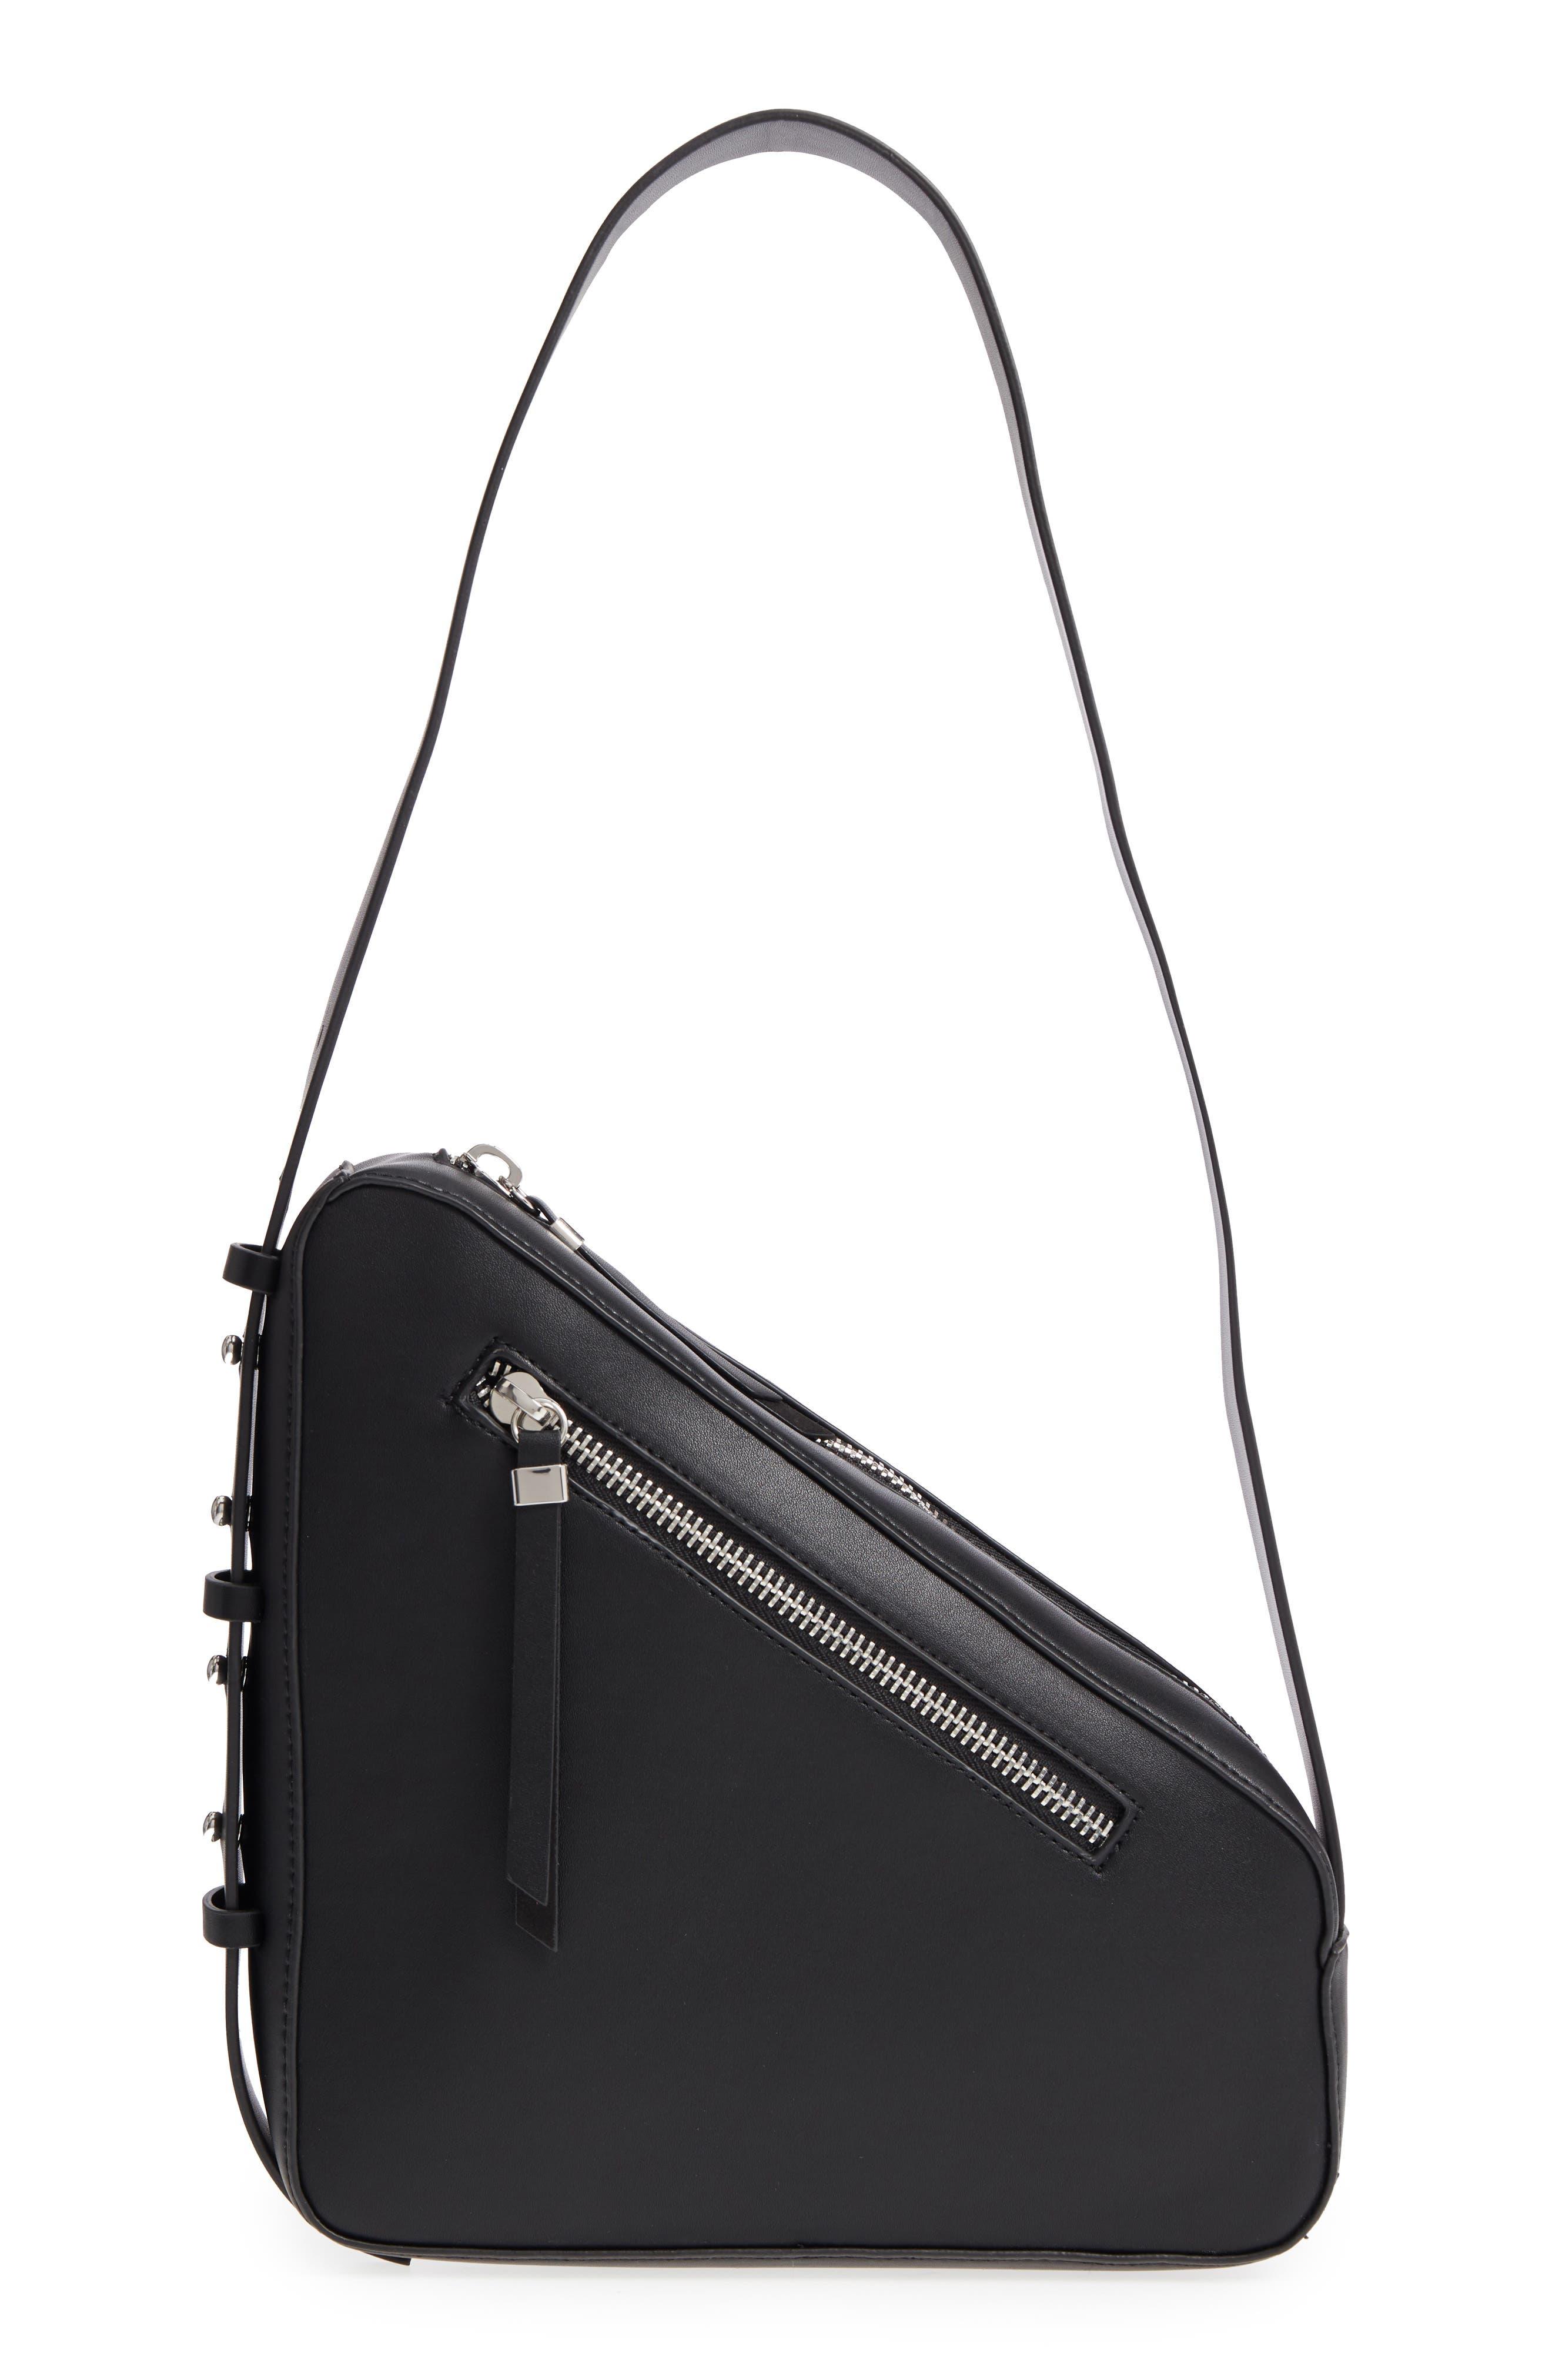 Topshop Triangle Zip Shoulder Bag